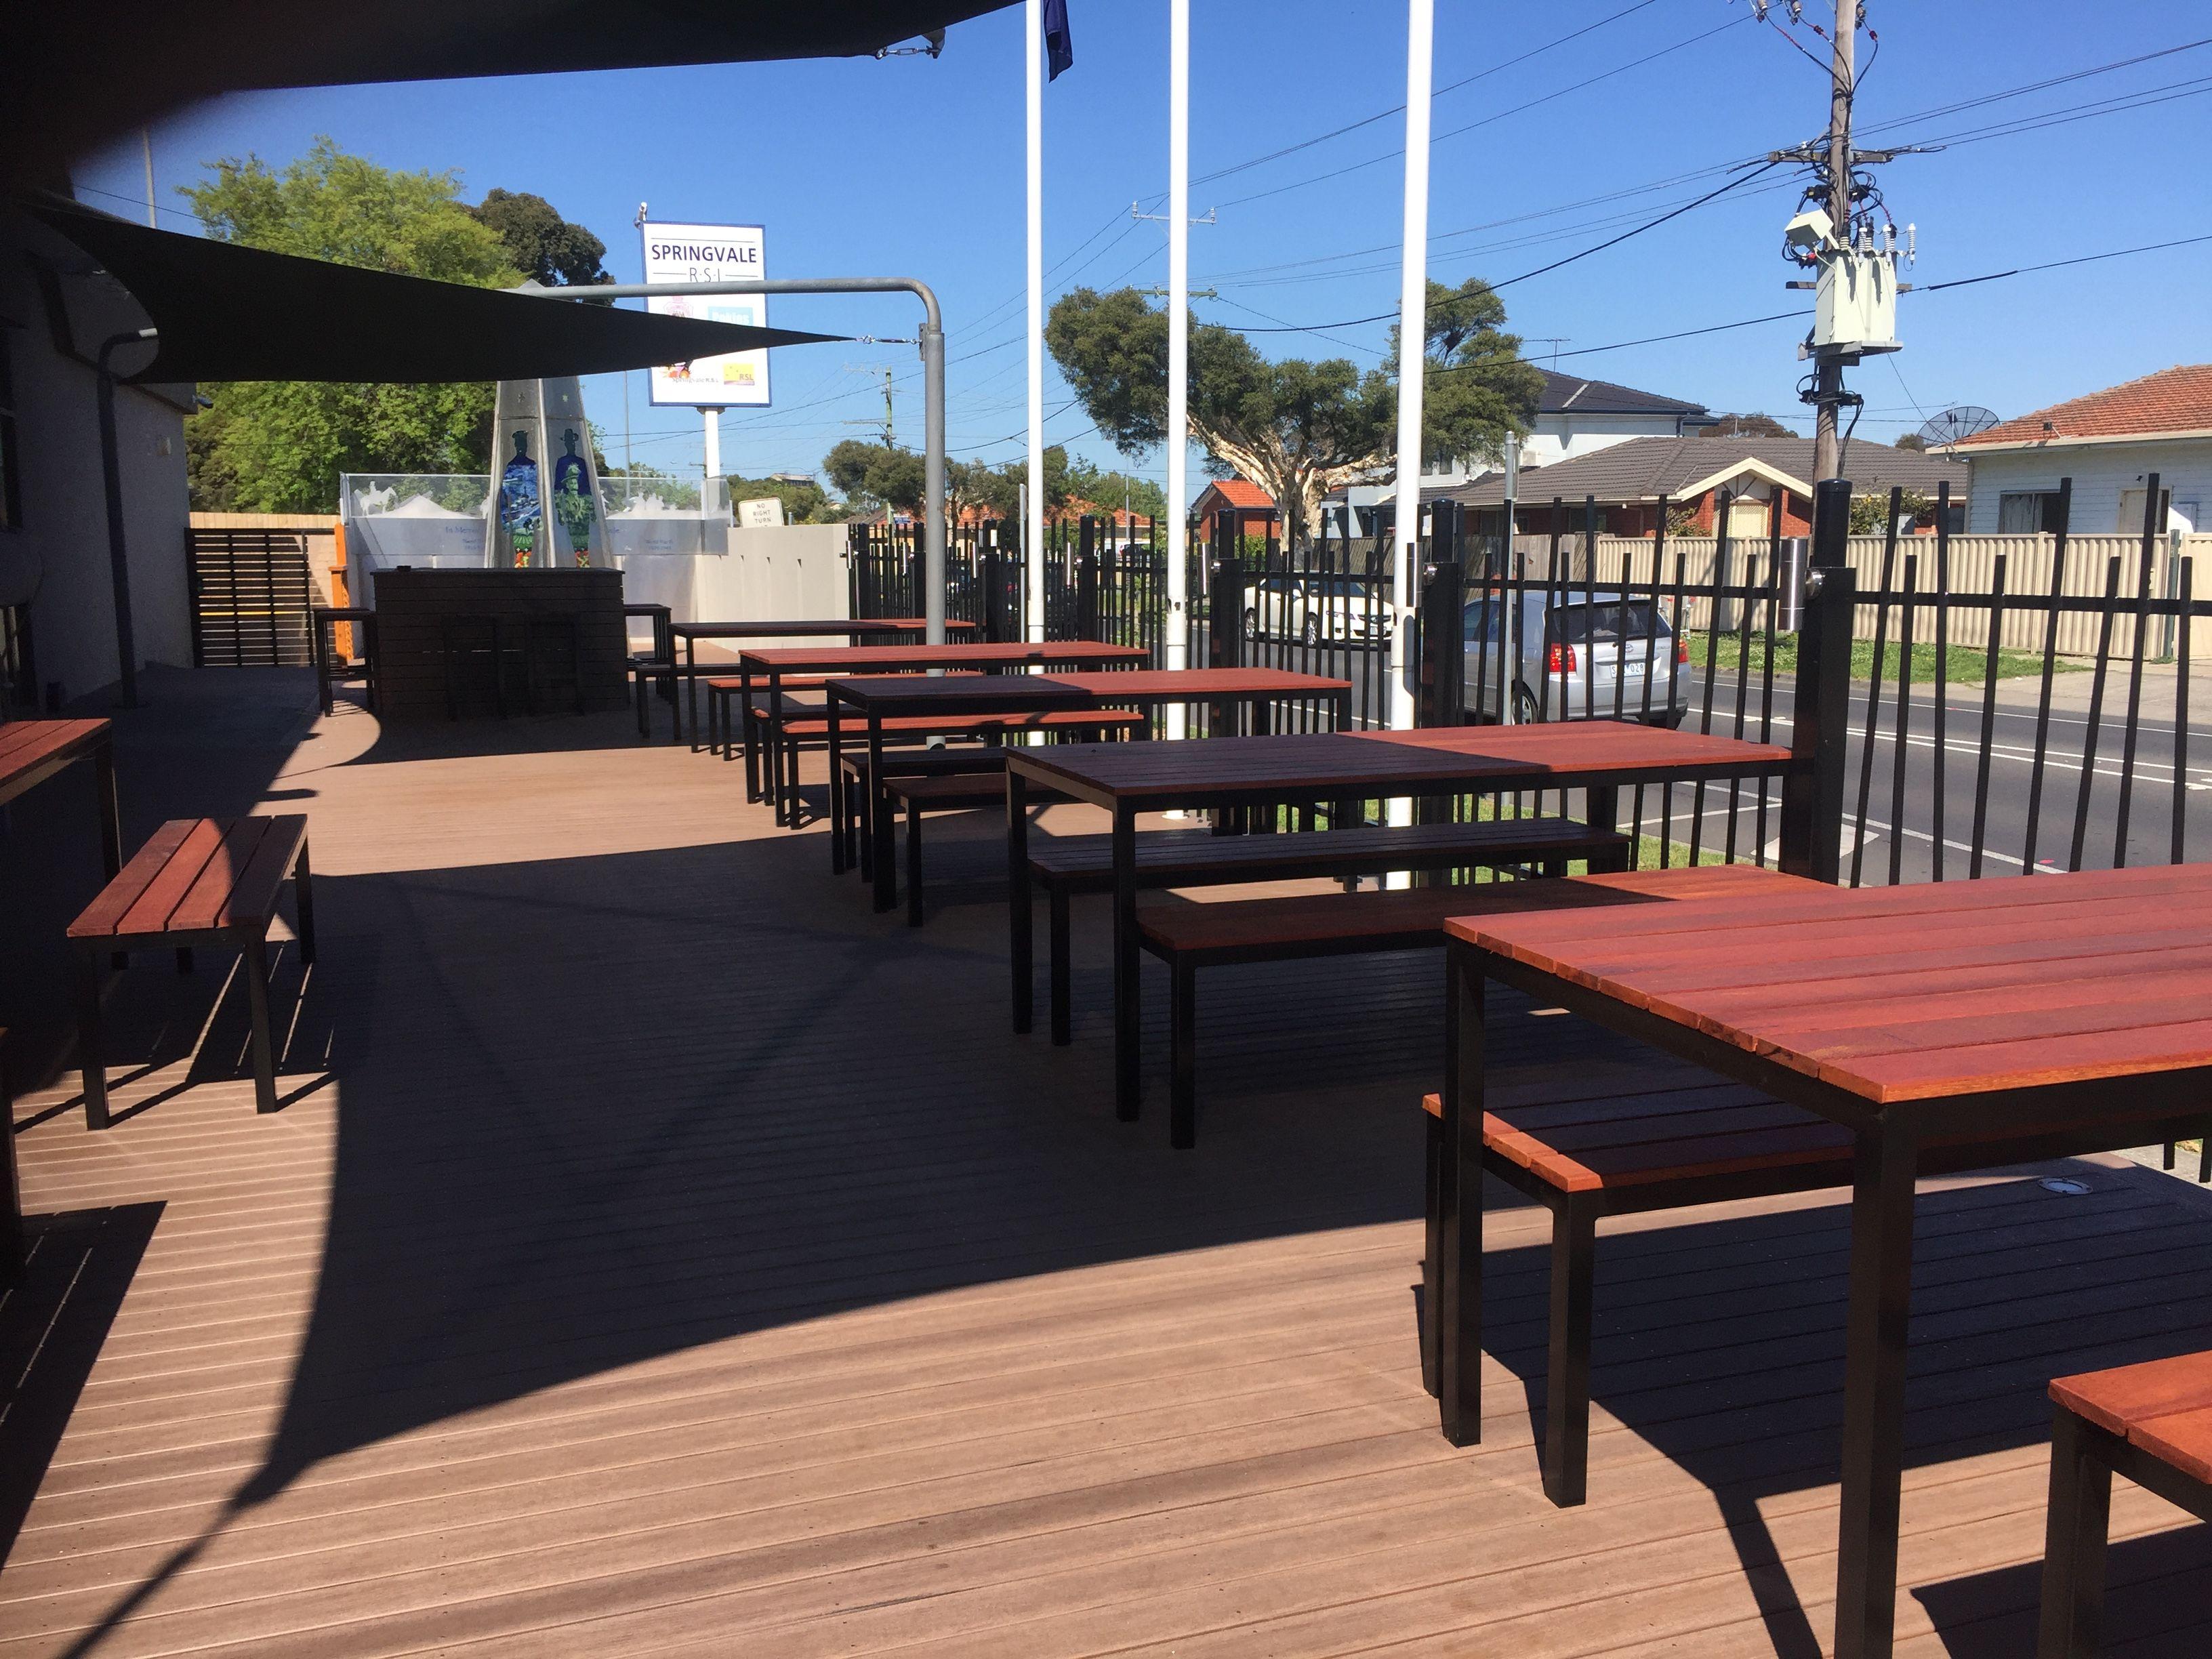 Commercial Outdoor Furniture Melbourne for Cafes, Bars ...